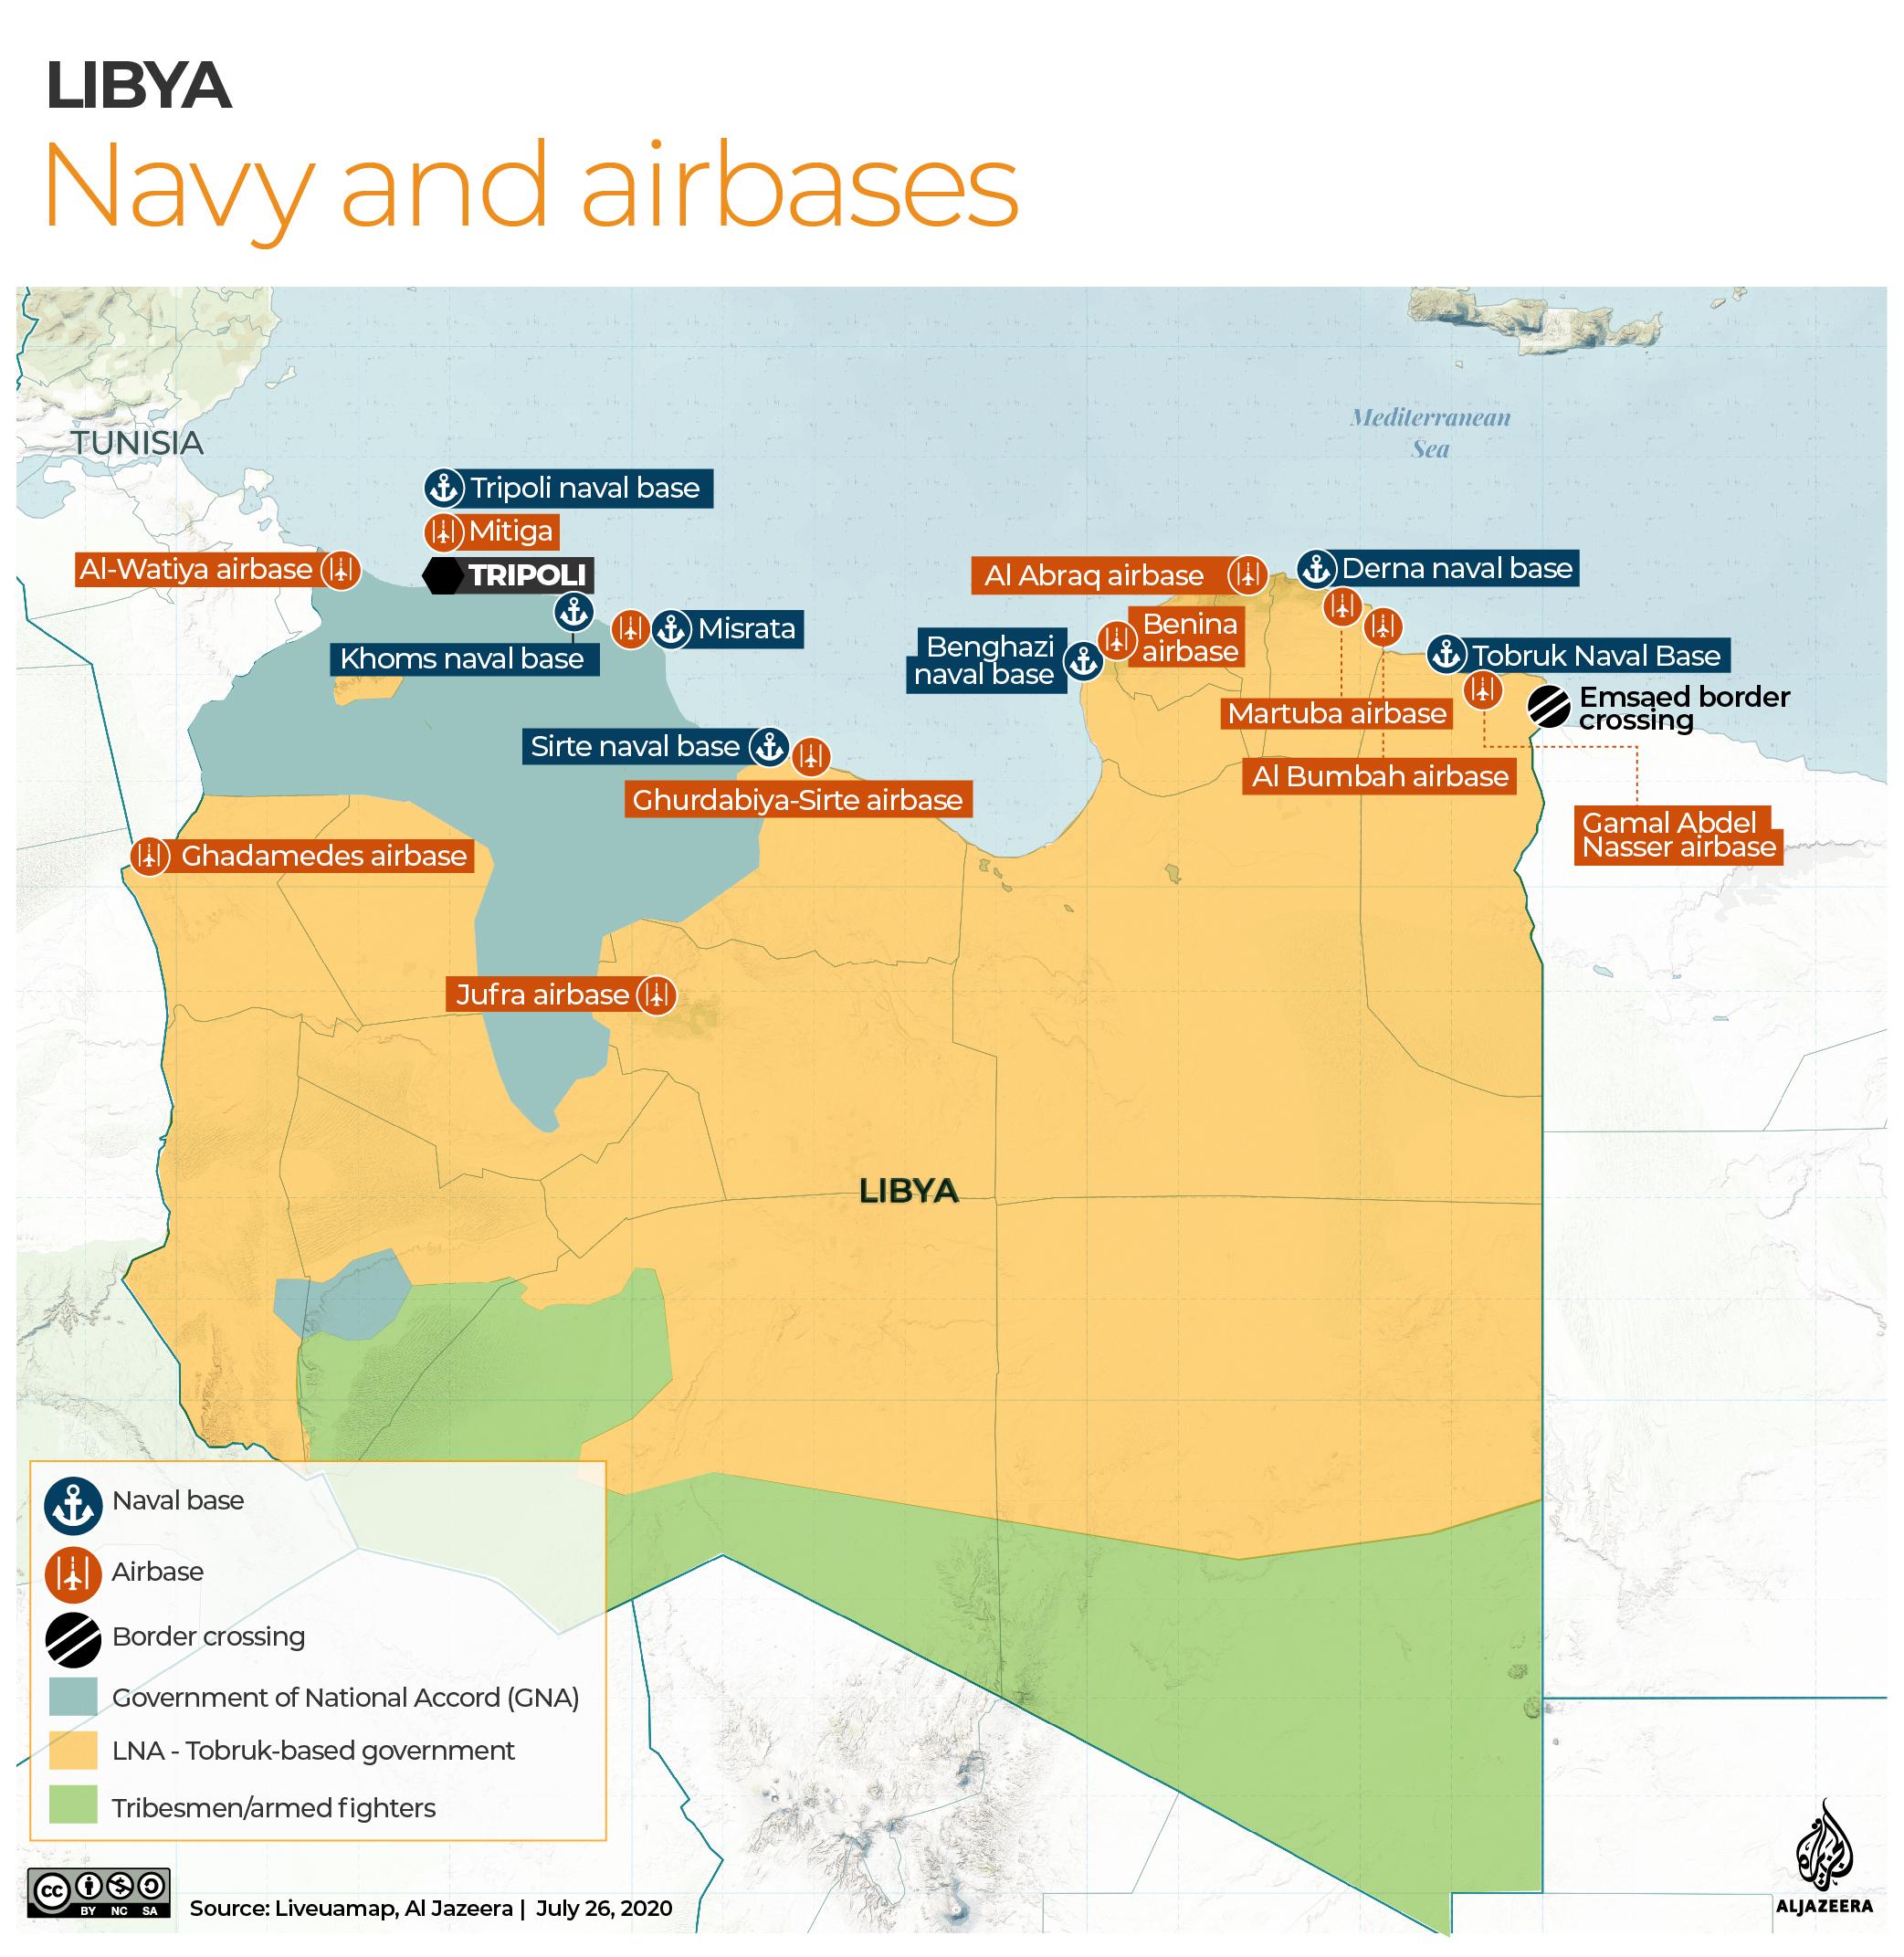 INTERACTIVE: Libya naval and airbases - July 27, 2020